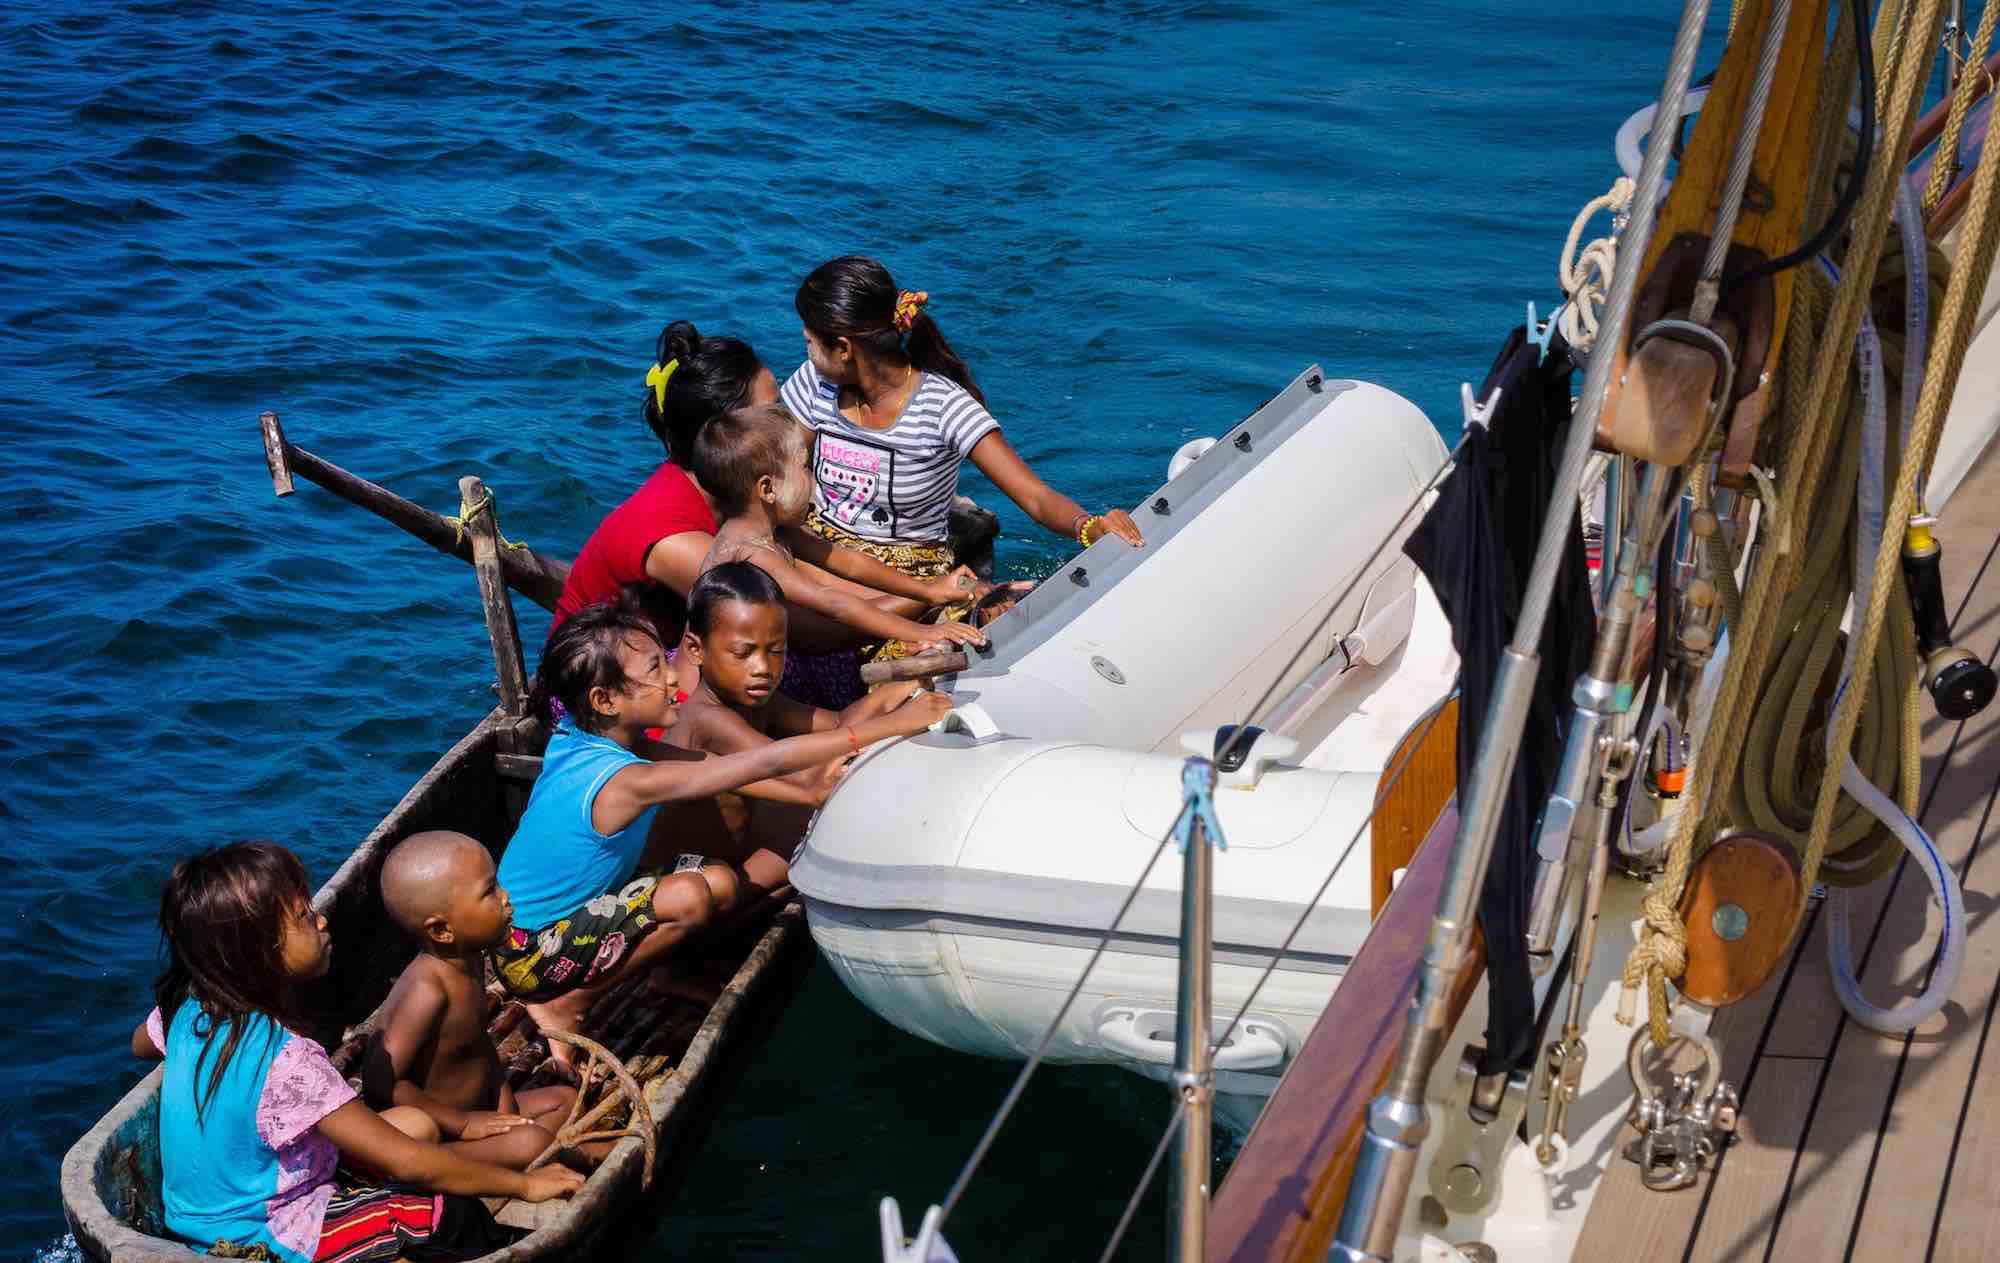 Dallinghoo_local kids holding on to yacht tender sailing trip in Mergui_XS.jpeg